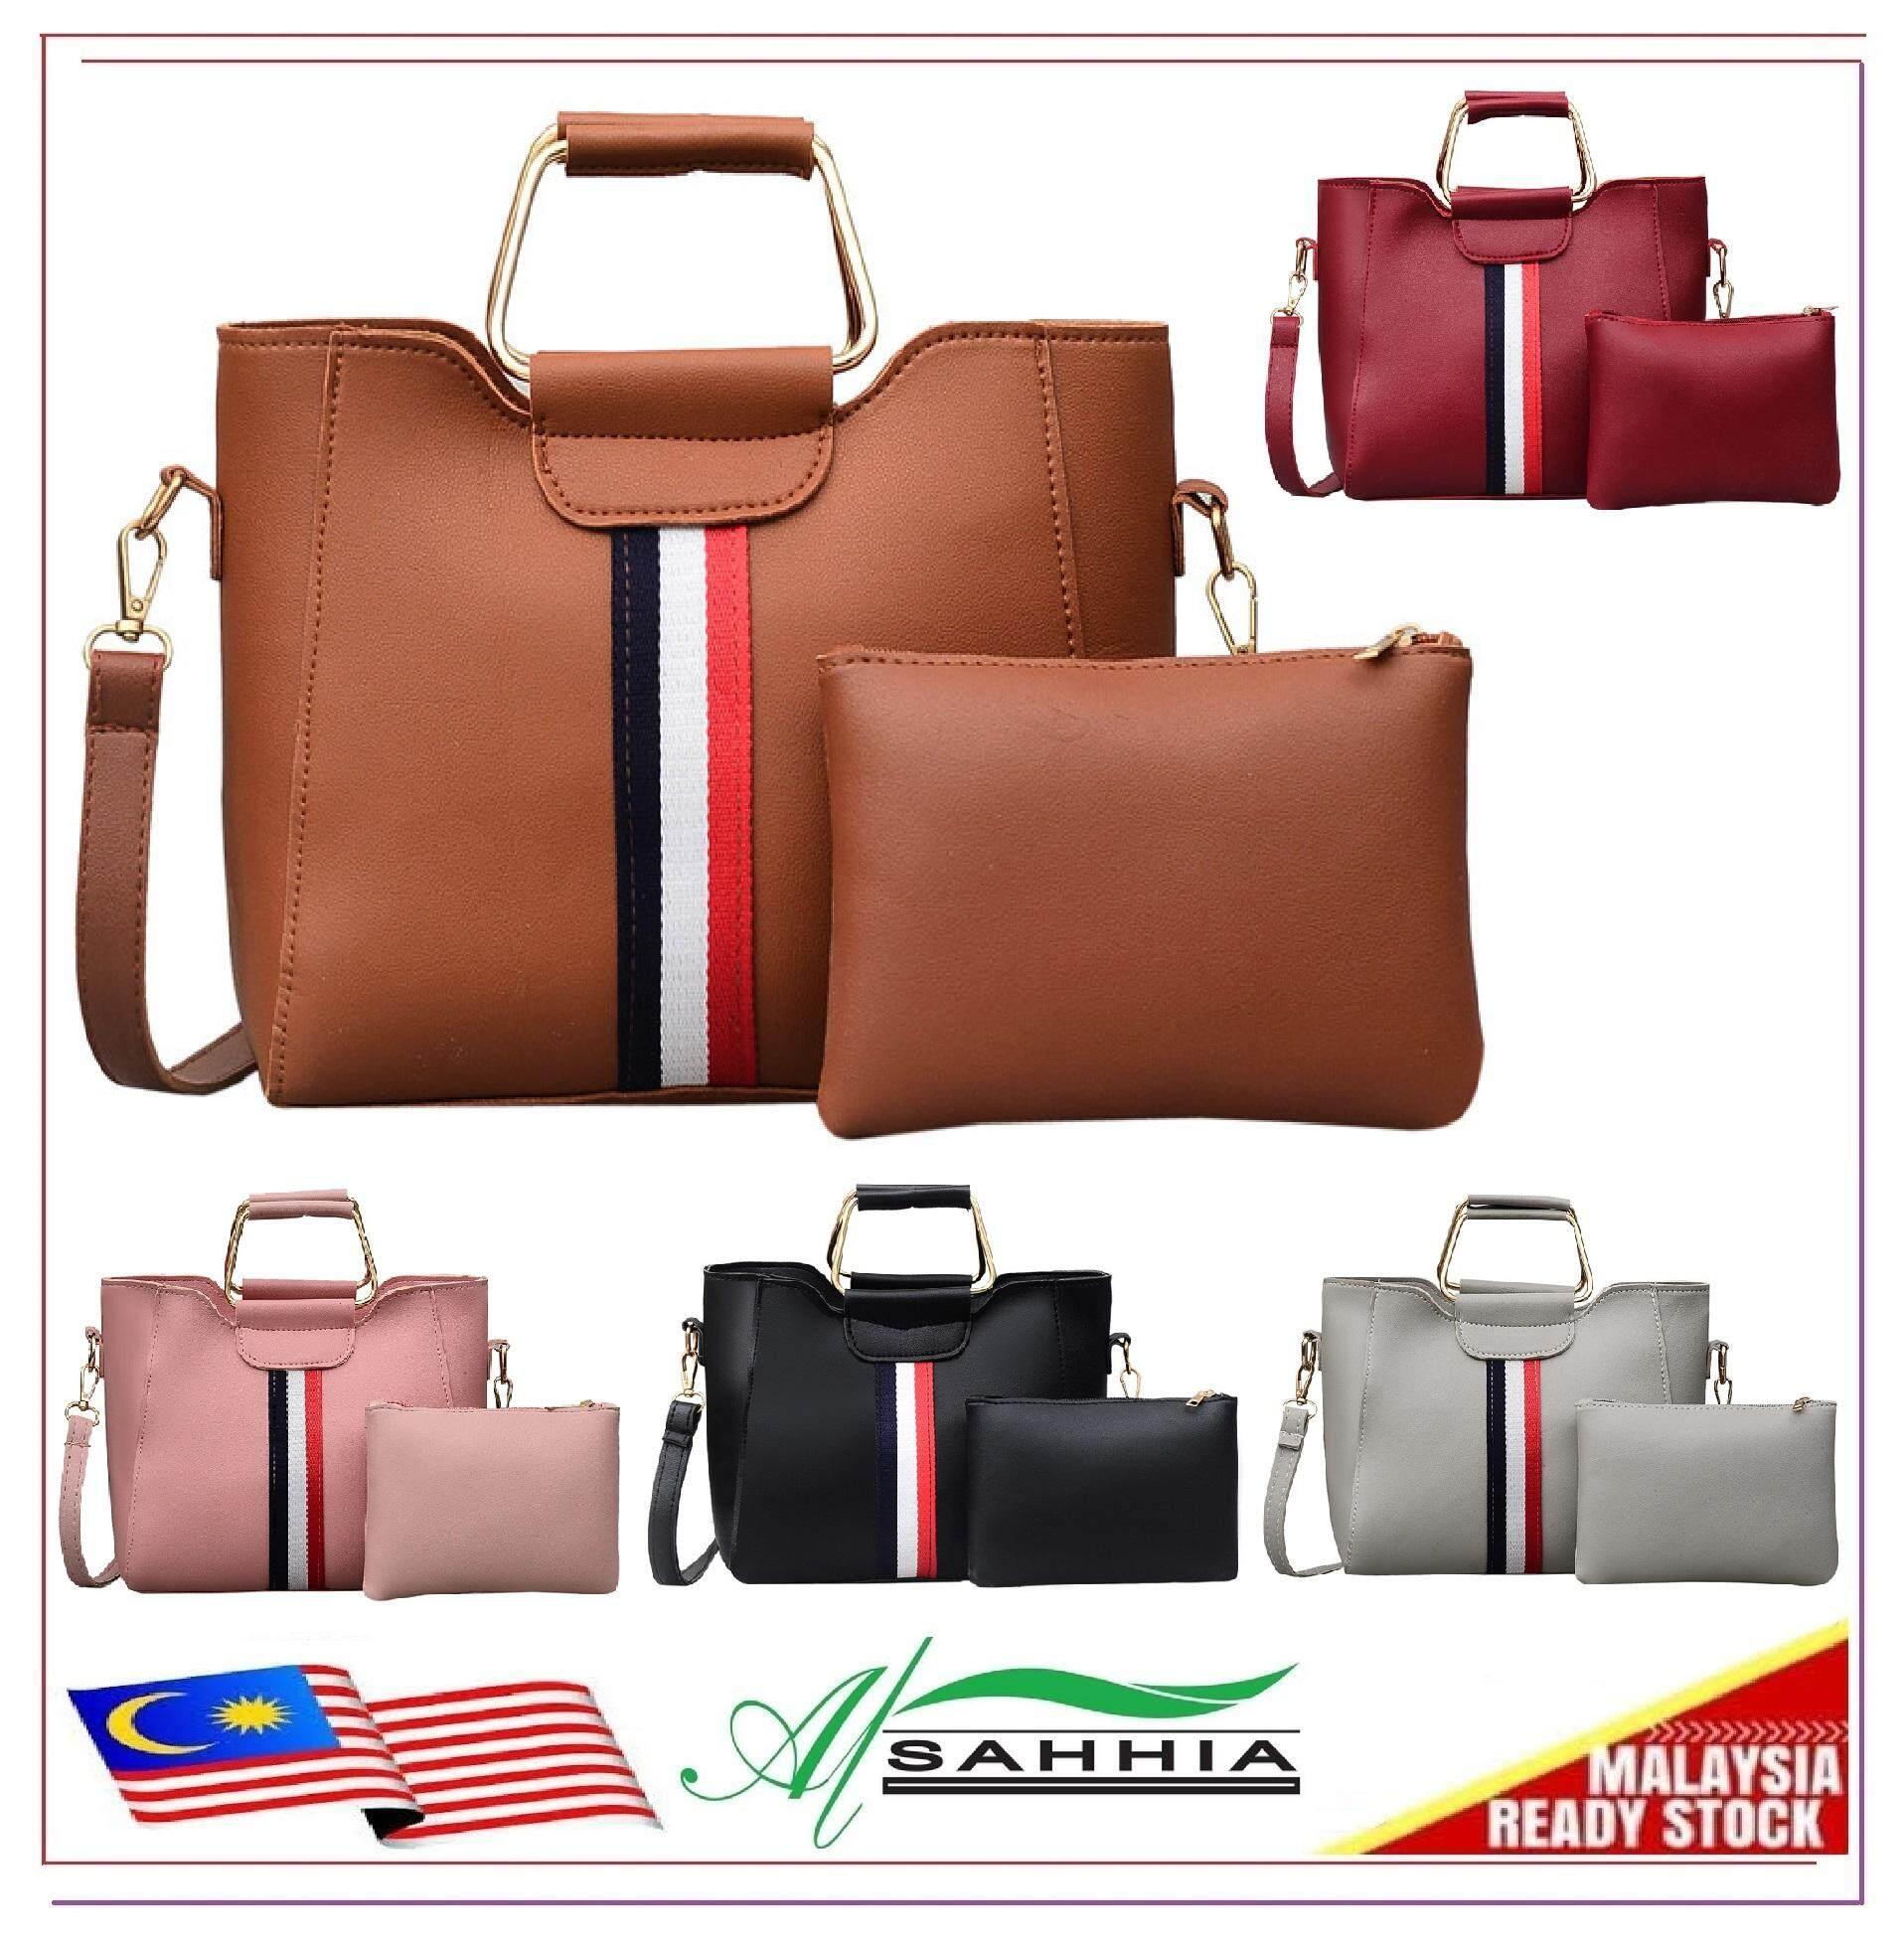 09575eff3 1P3 Al Sahhia Ready Stock 2 in 1 3 Line Sling Shoulder Purse Women Bags